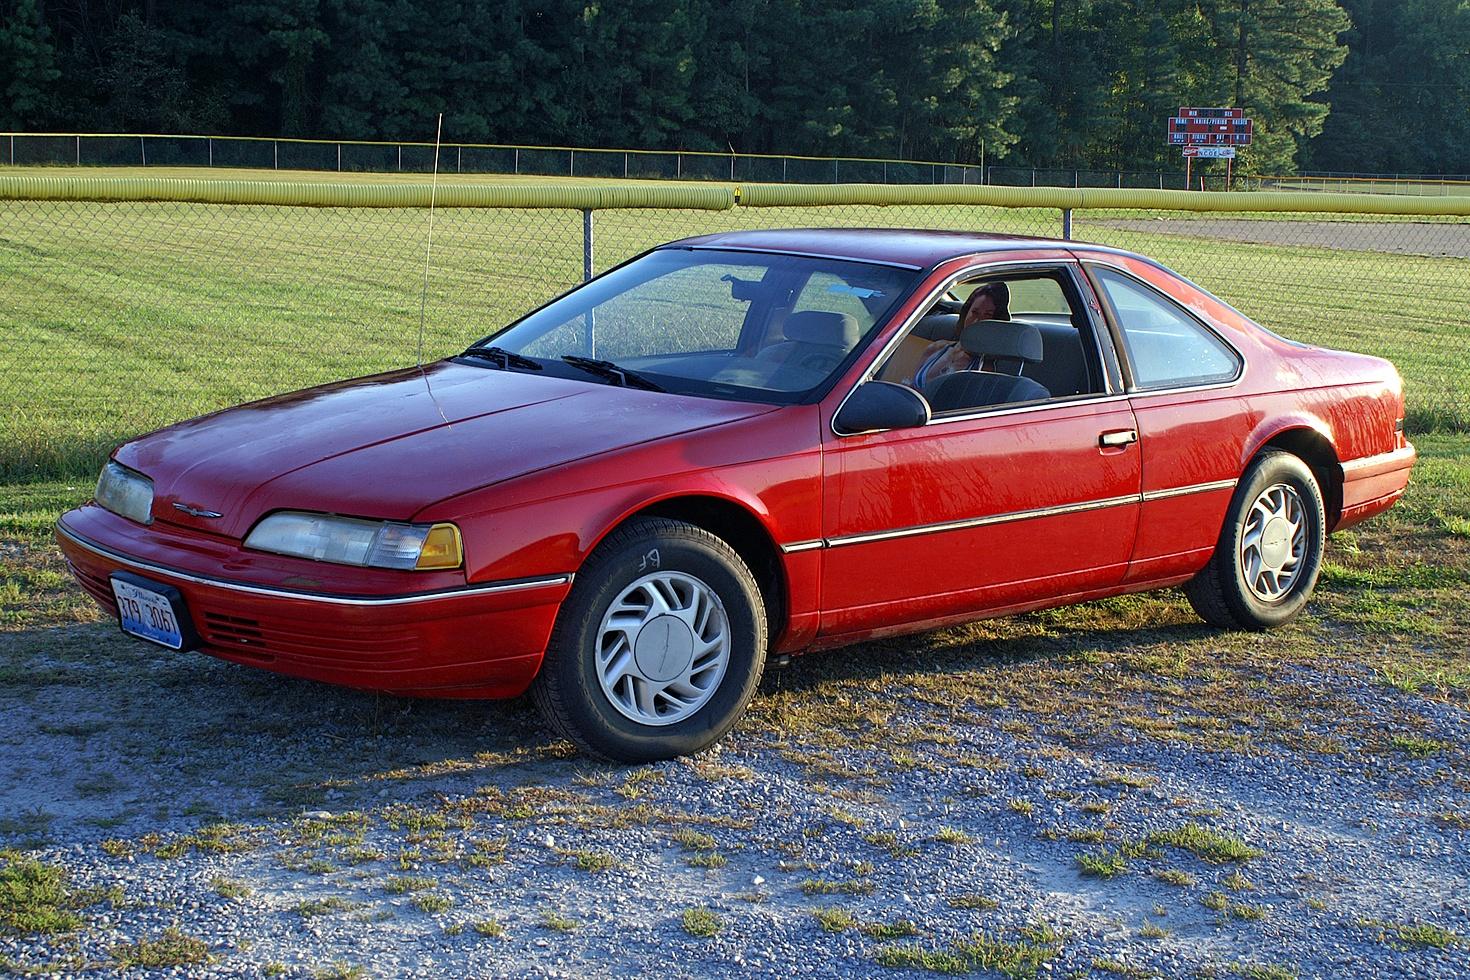 1991 Ford Thunderbird LX